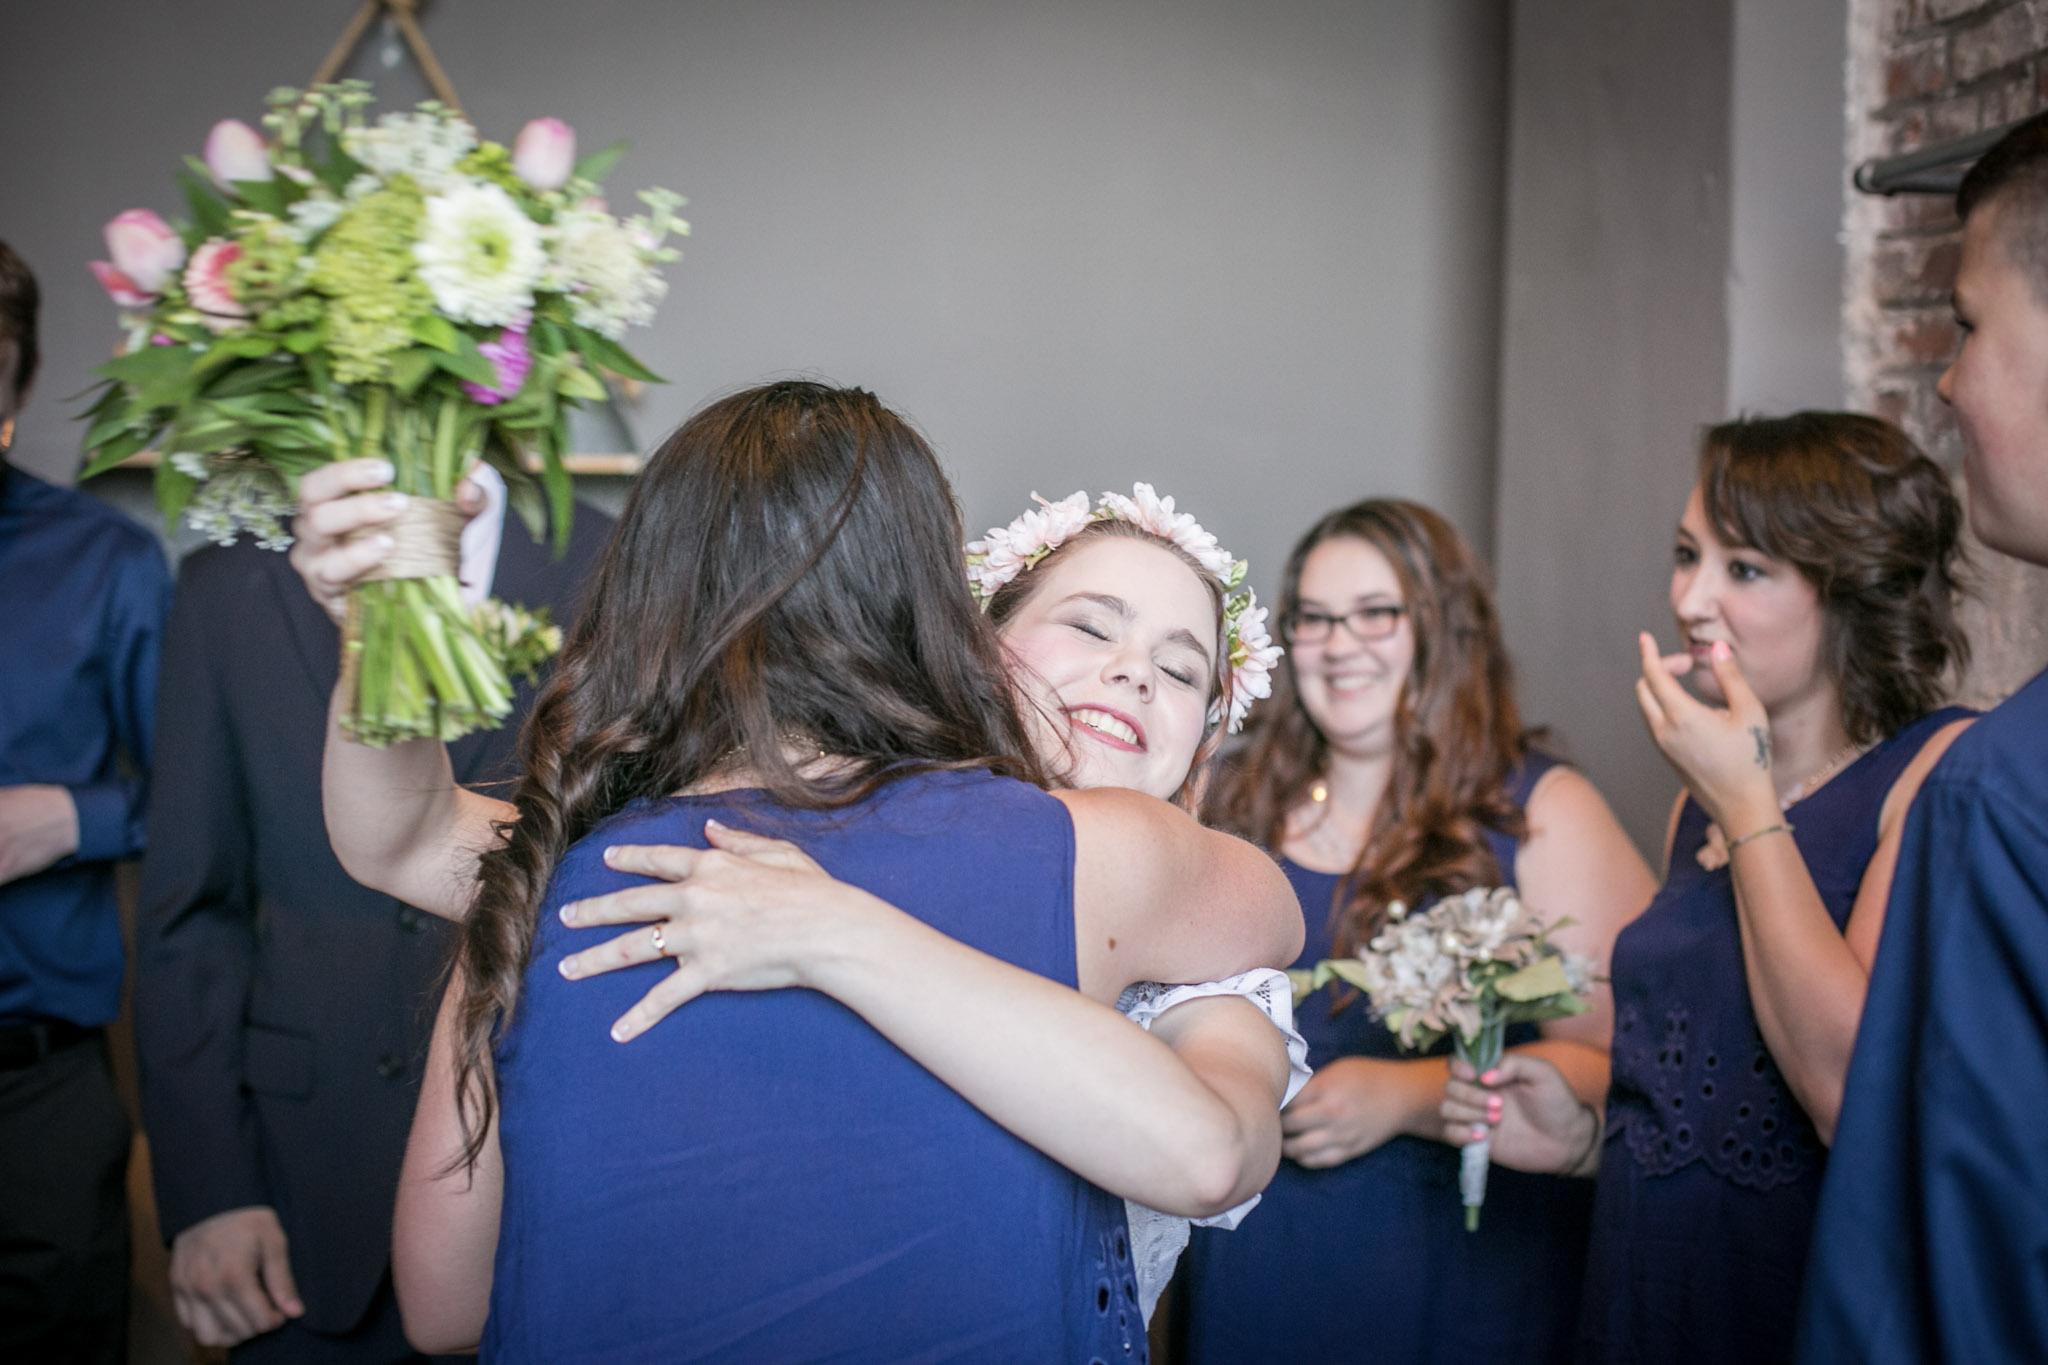 Kansas_City_Small_Wedding_Venue_Elope_Intimate_Ceremony_Budget_Affordable_Sophie&Philip_145.jpg